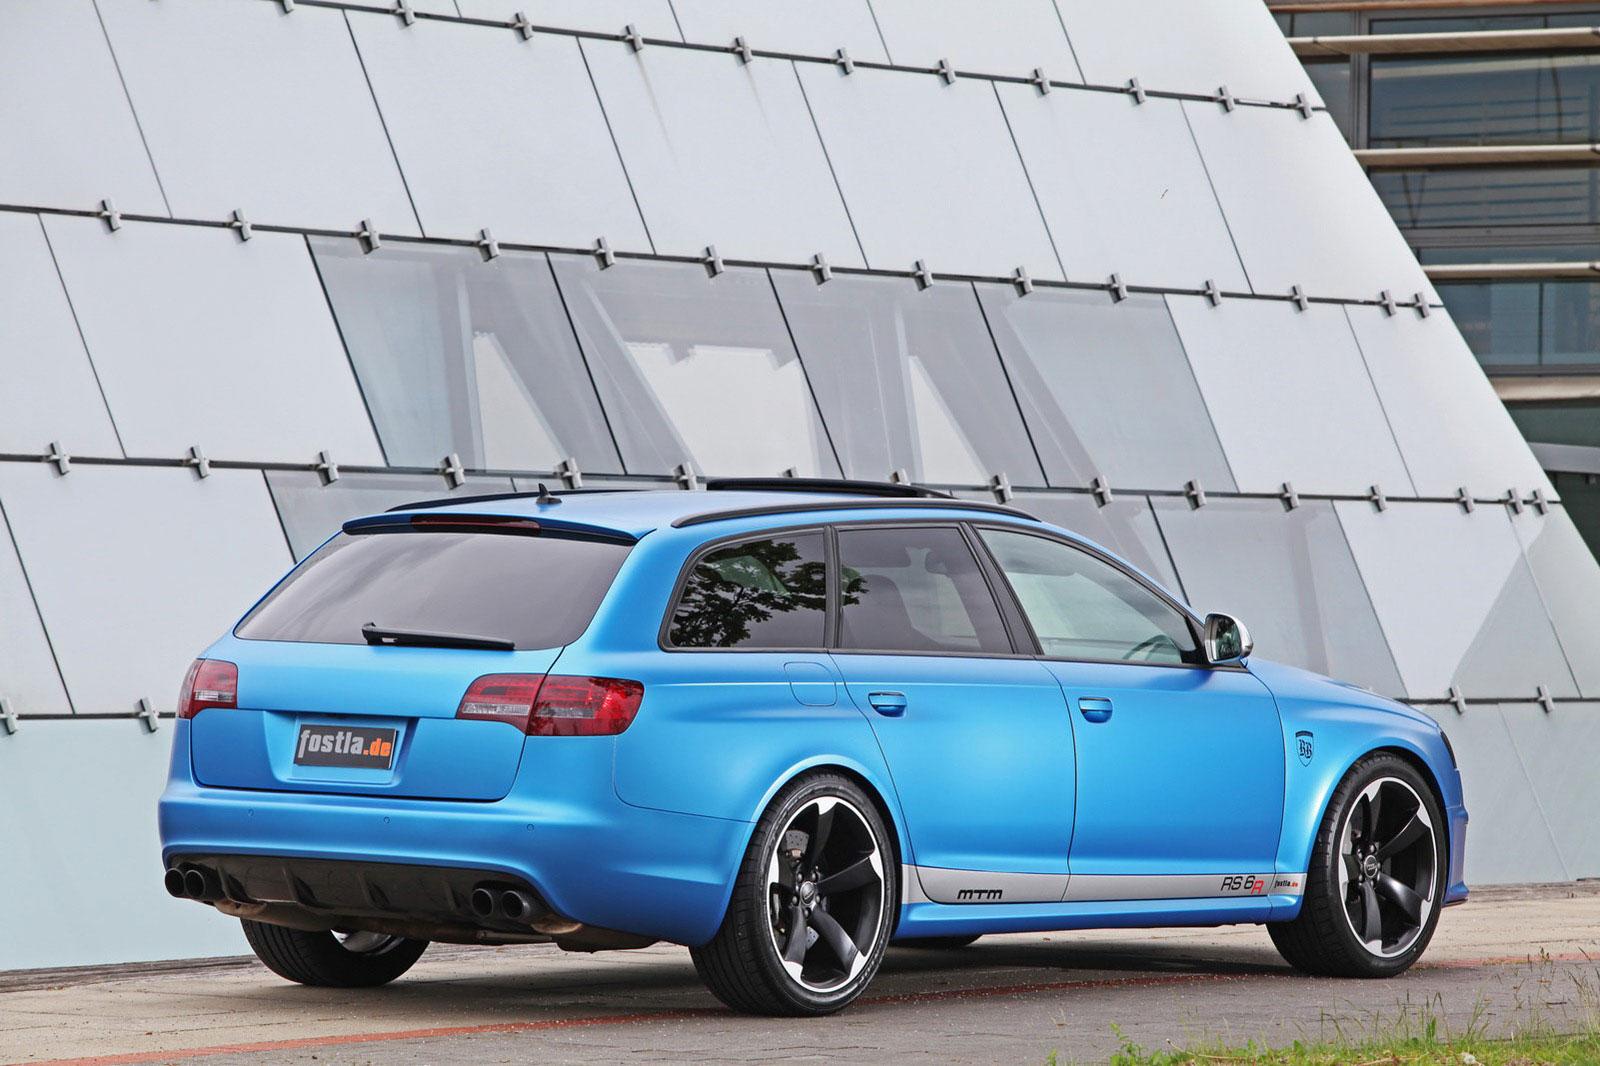 Fostla a MTM vytvořili velmi našlapané Audi RS6 Avant 4